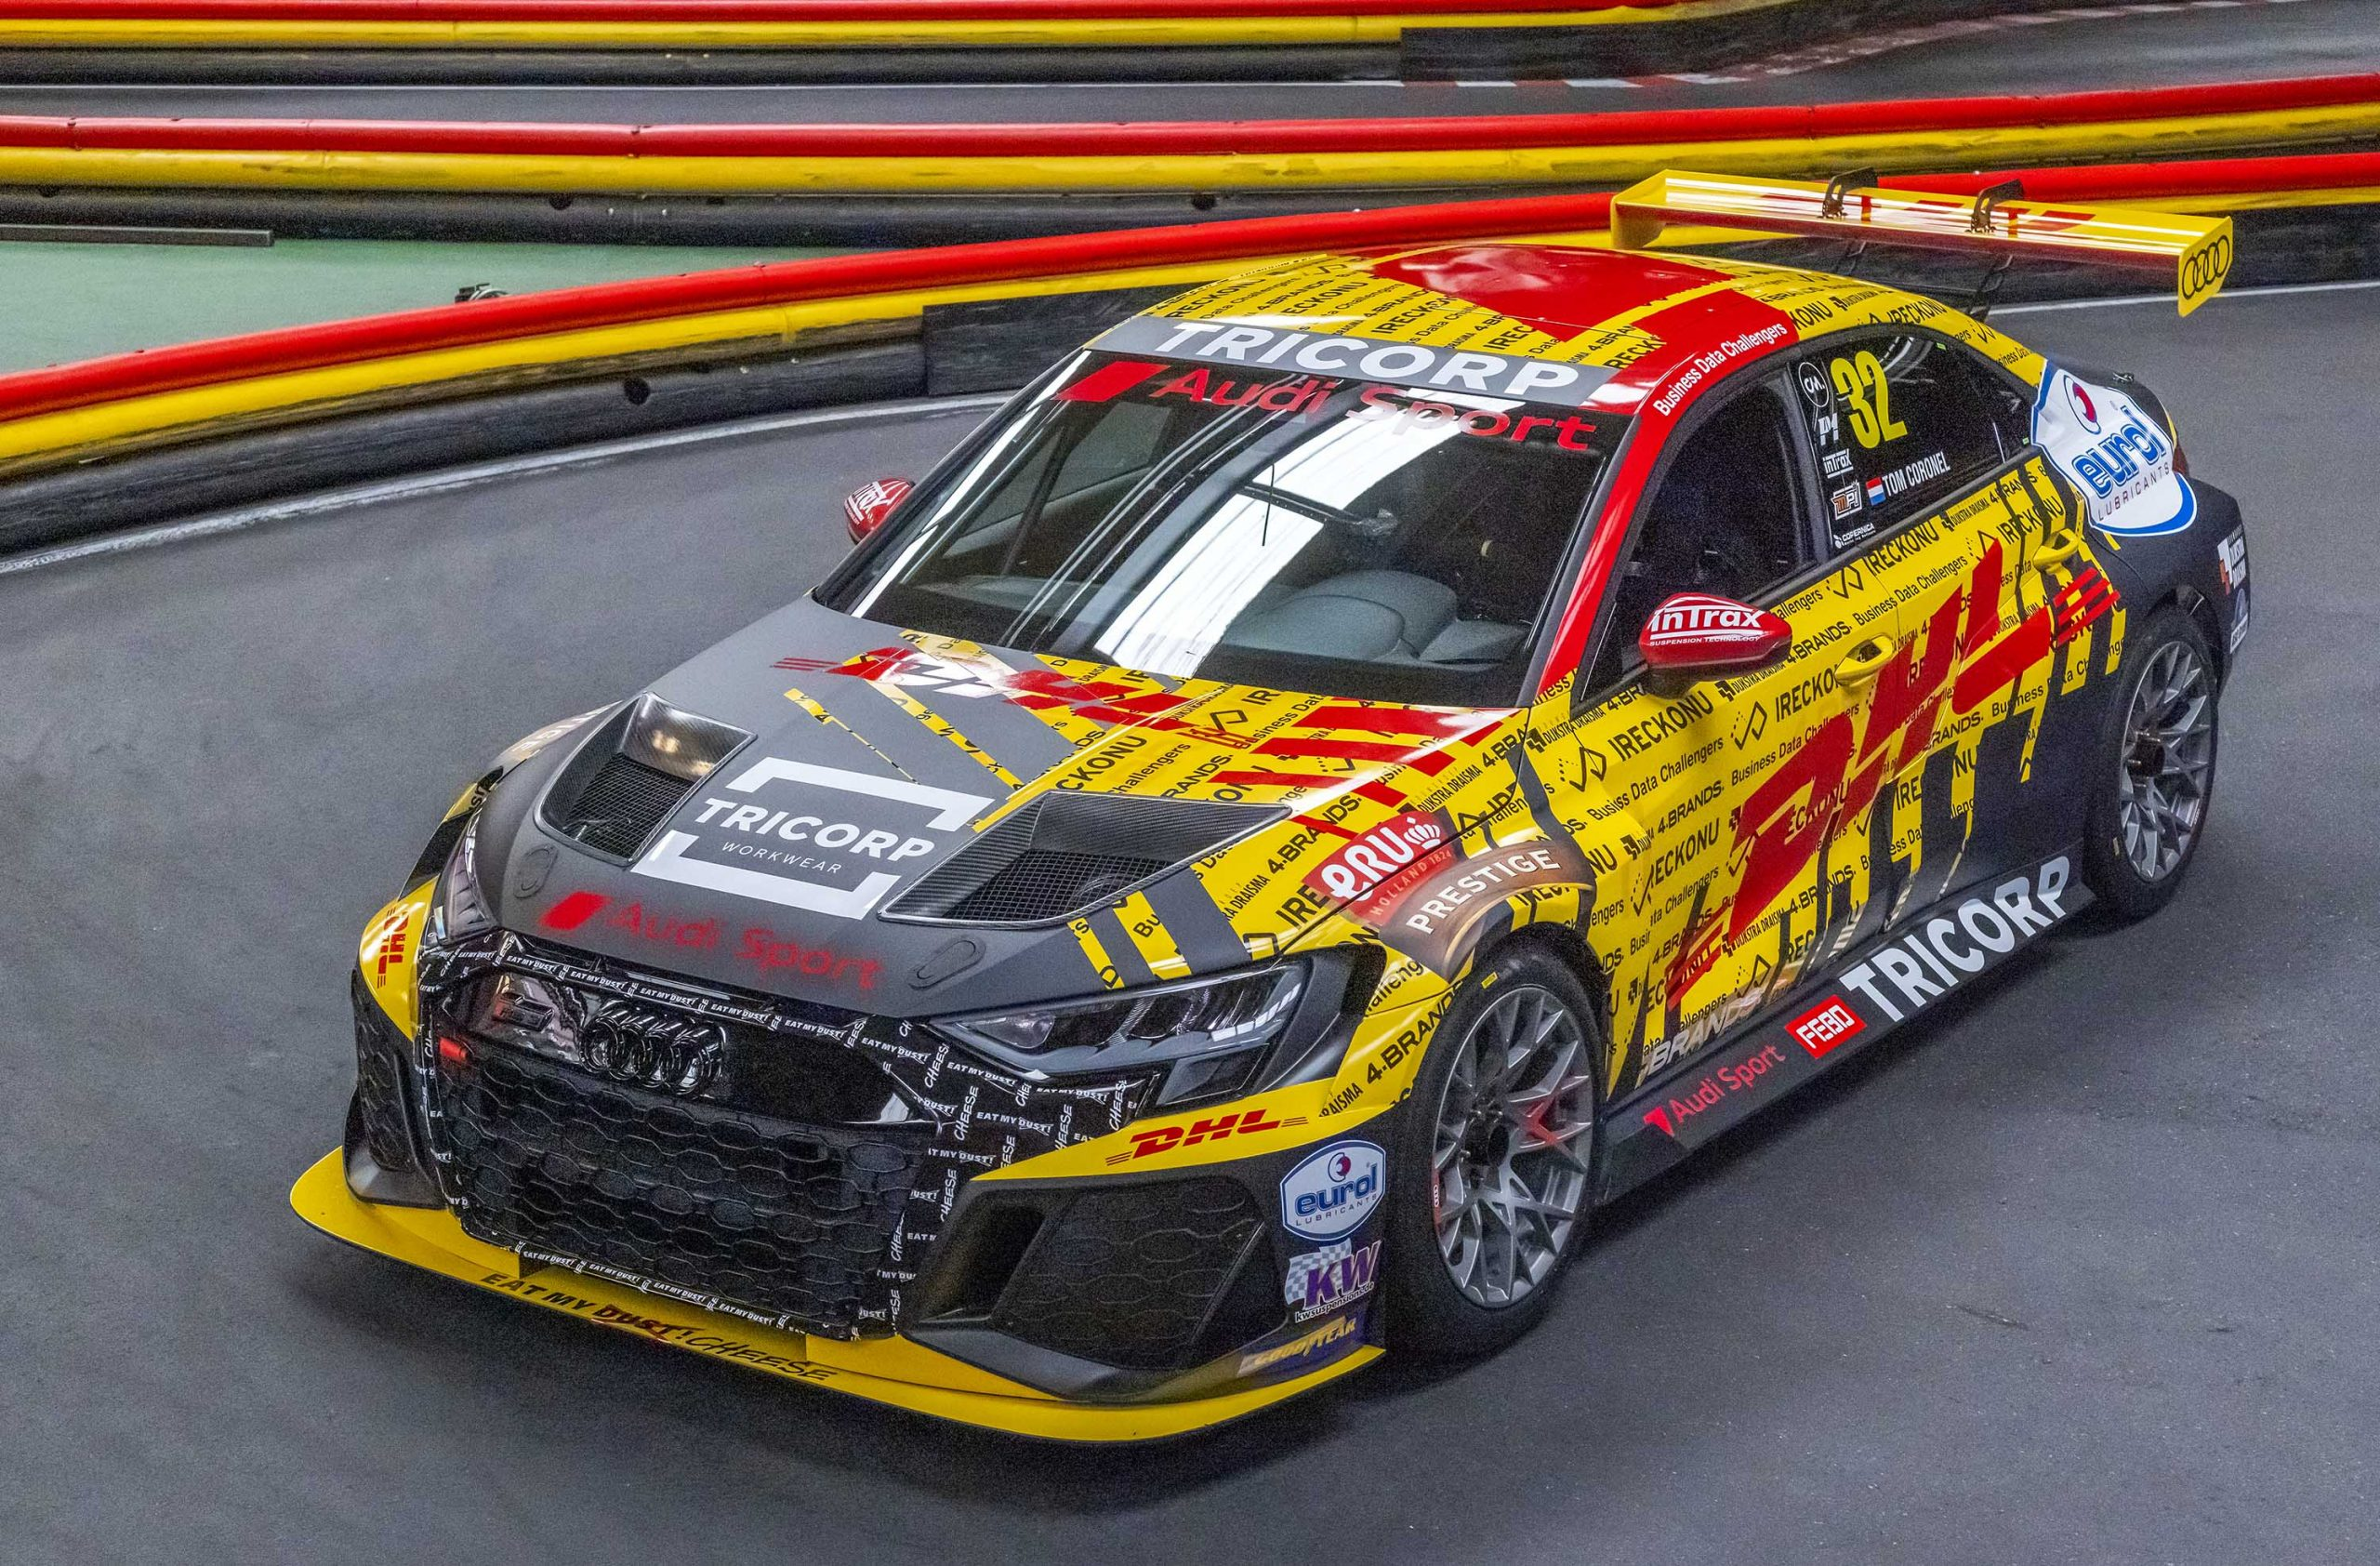 Tom Coronel 2021-es autóját is megmutatta.<br />Fotó: FIA WTCR Media